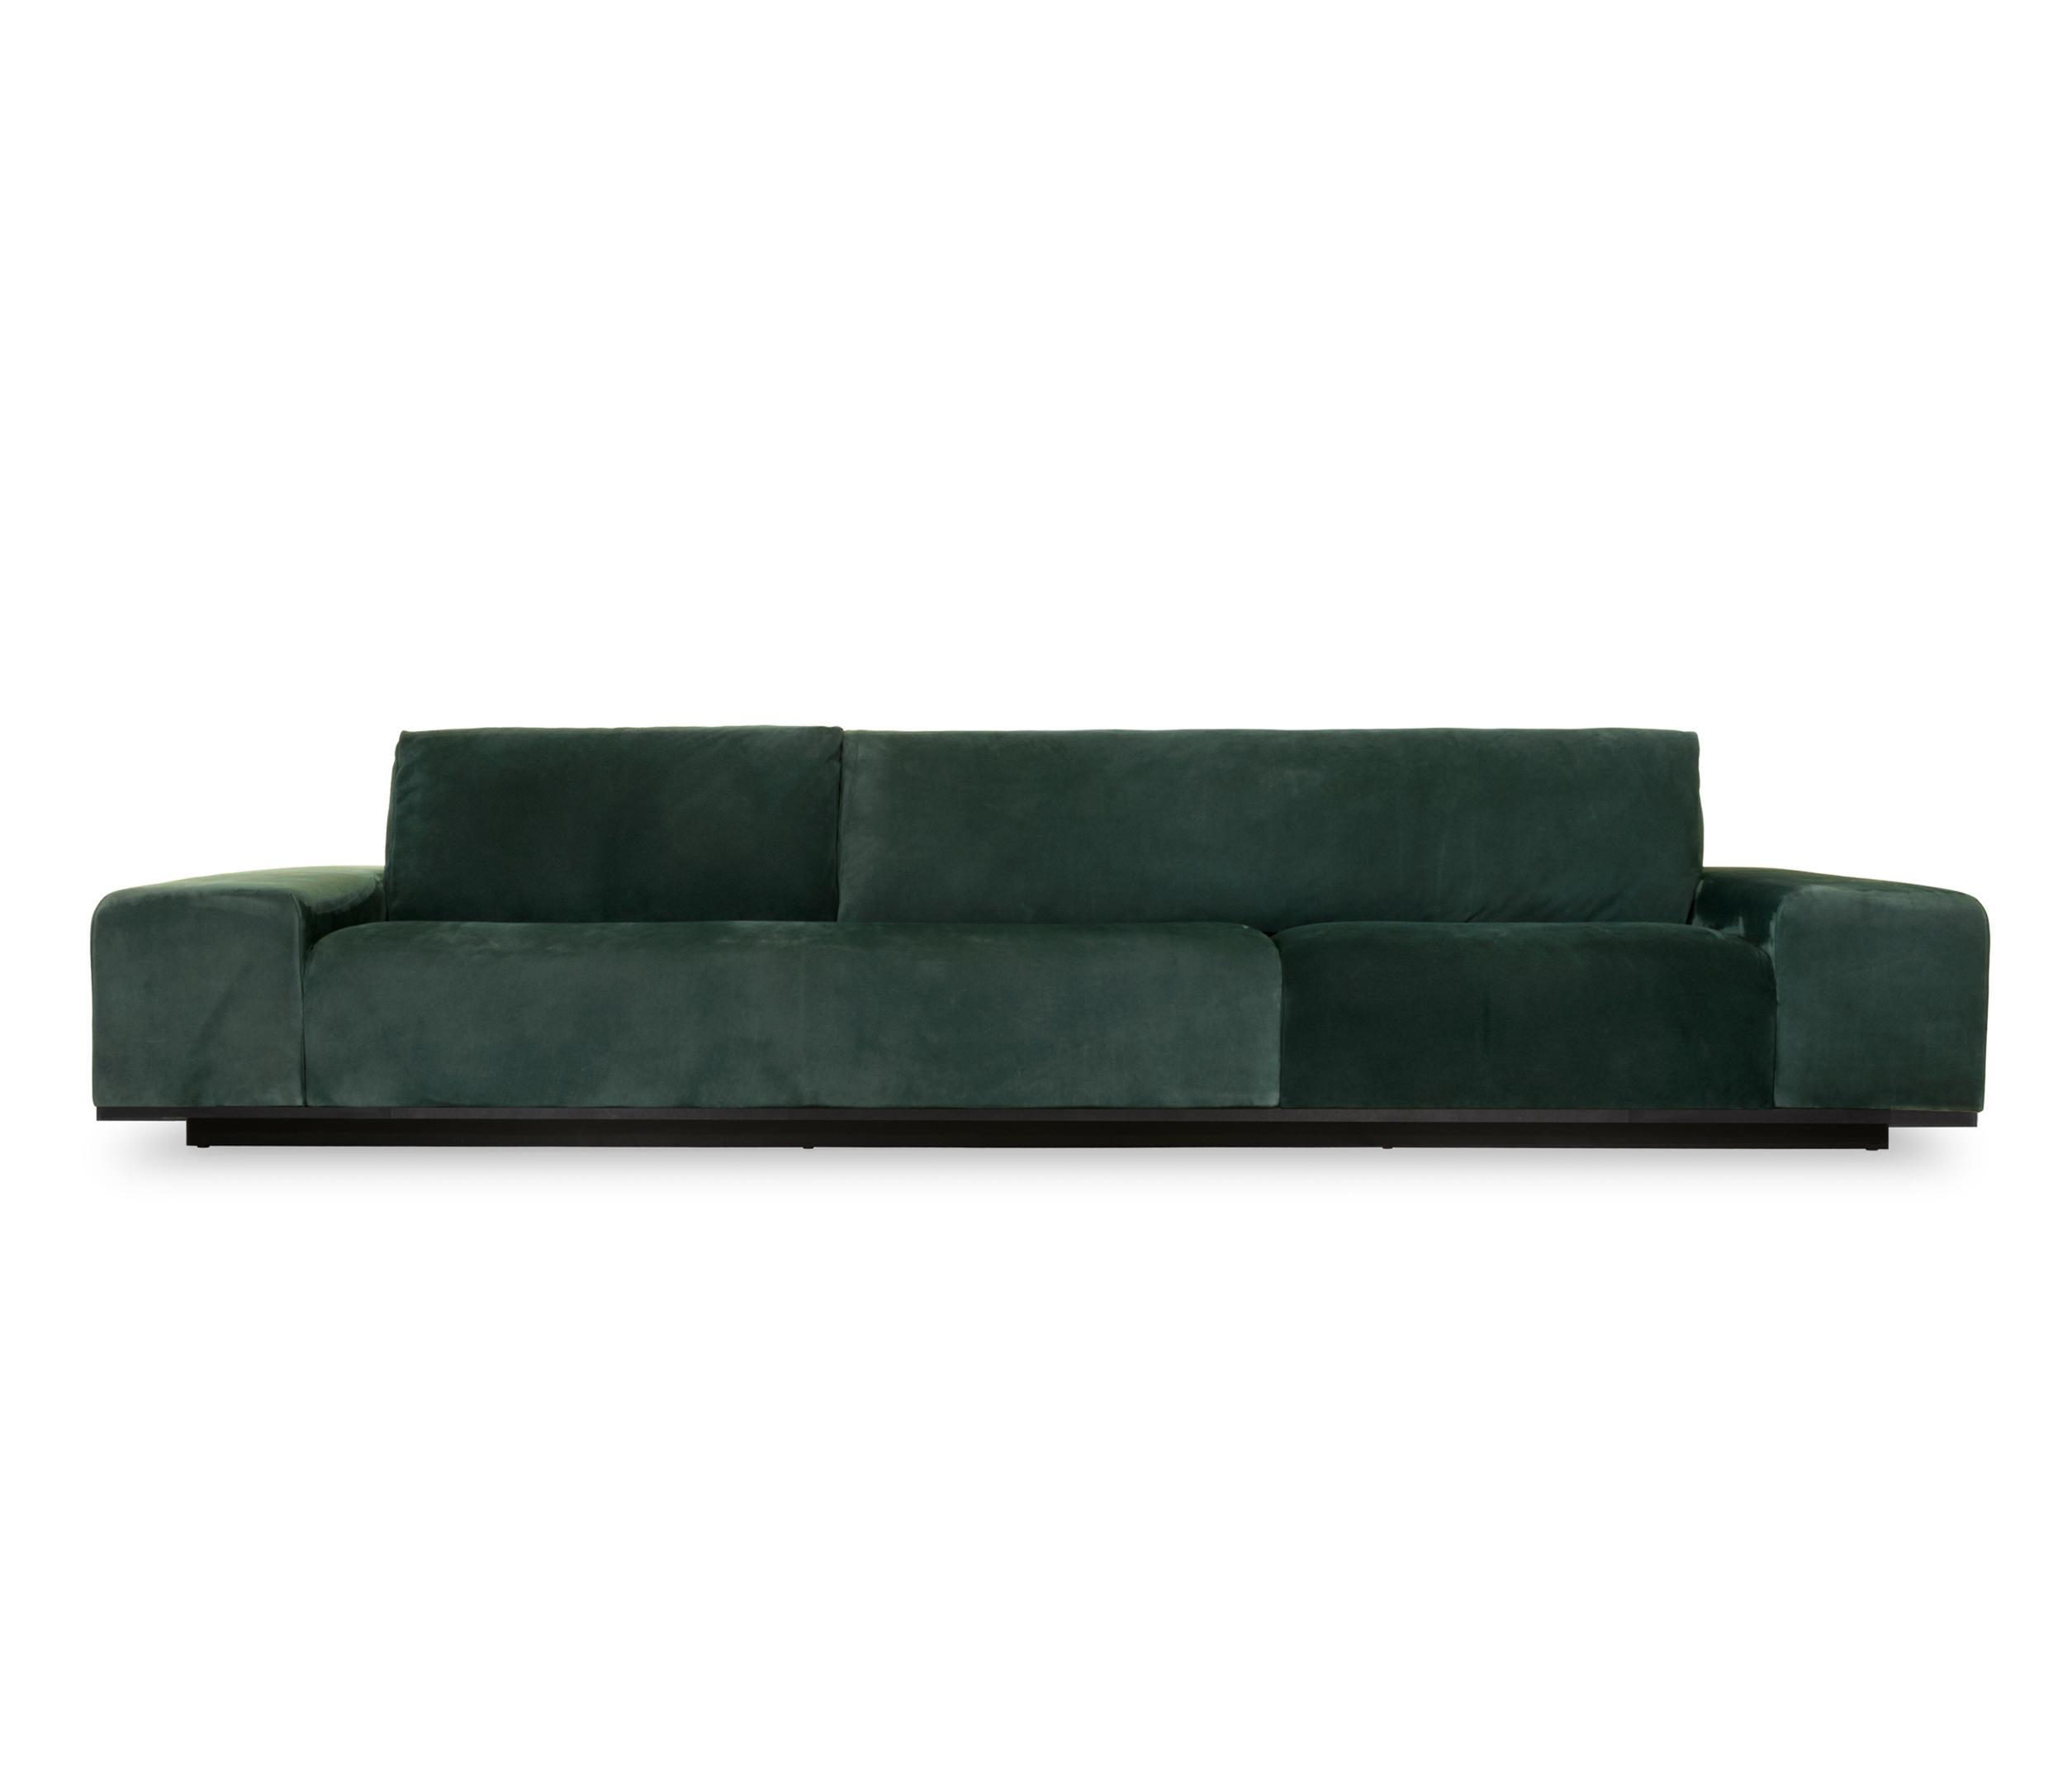 baxter sofa mid century sleeper sofas monsieur lounge from architonic